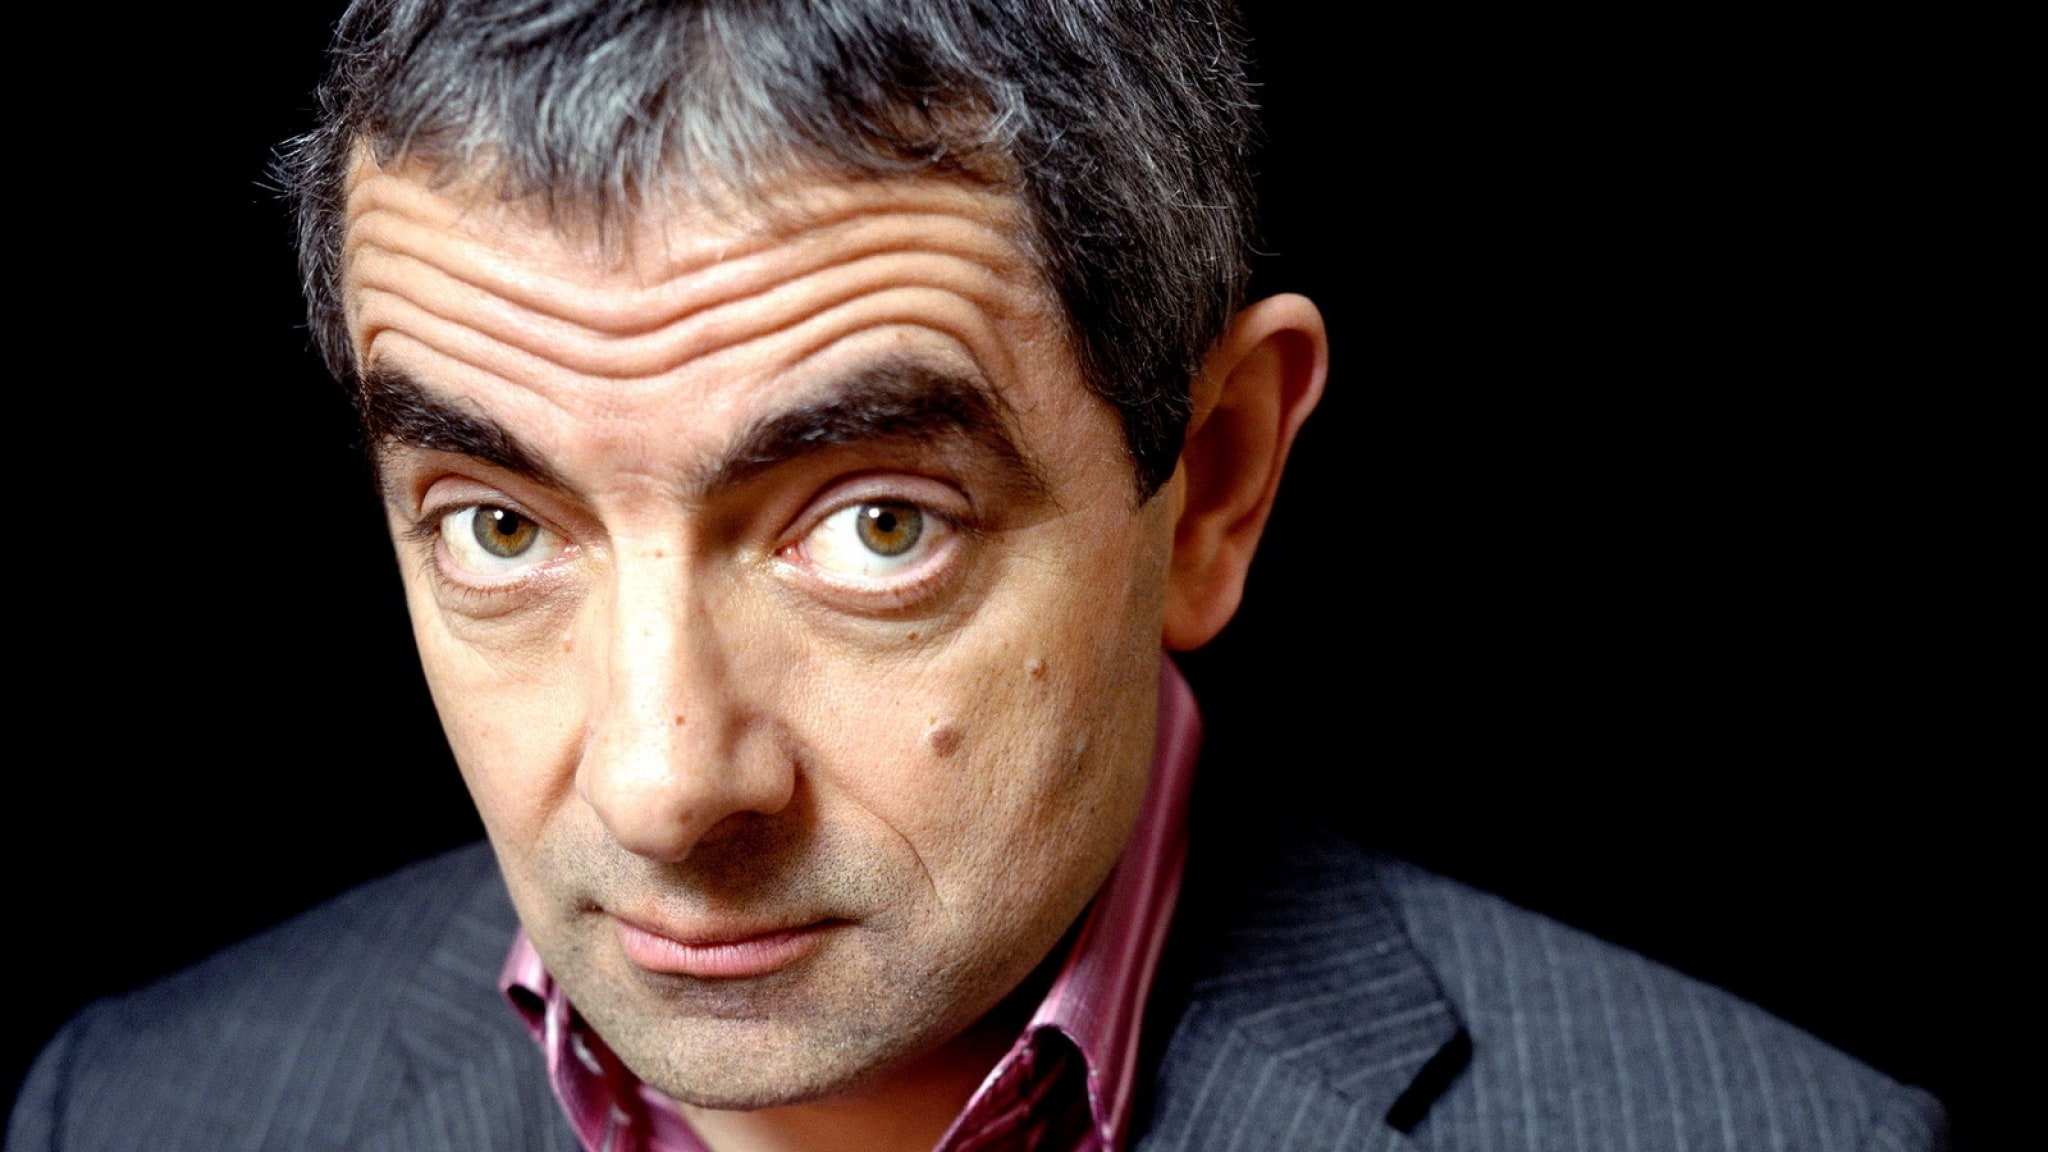 Rowan Atkinson Hd Wallpapers 7wallpapersnet